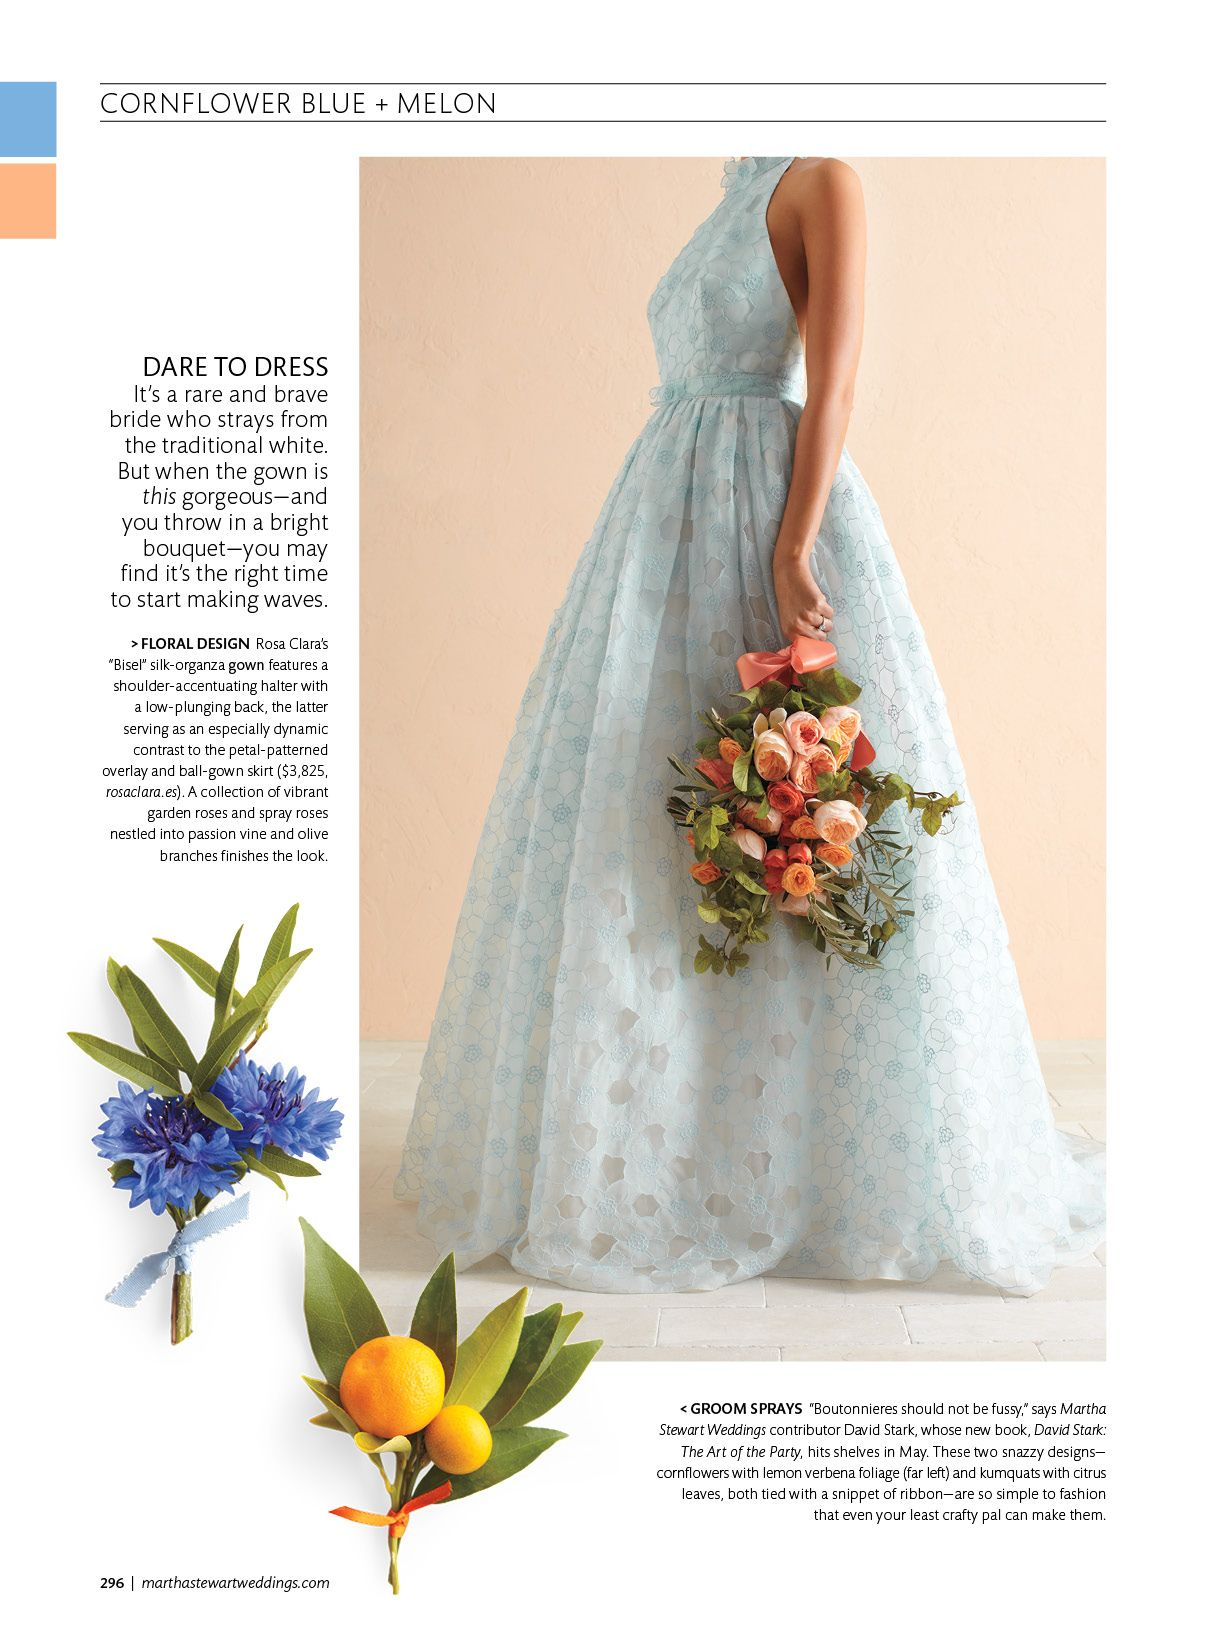 Design your own wedding dress near me  Pale blue silk organza wedding dress by Rosa Clara featured in the